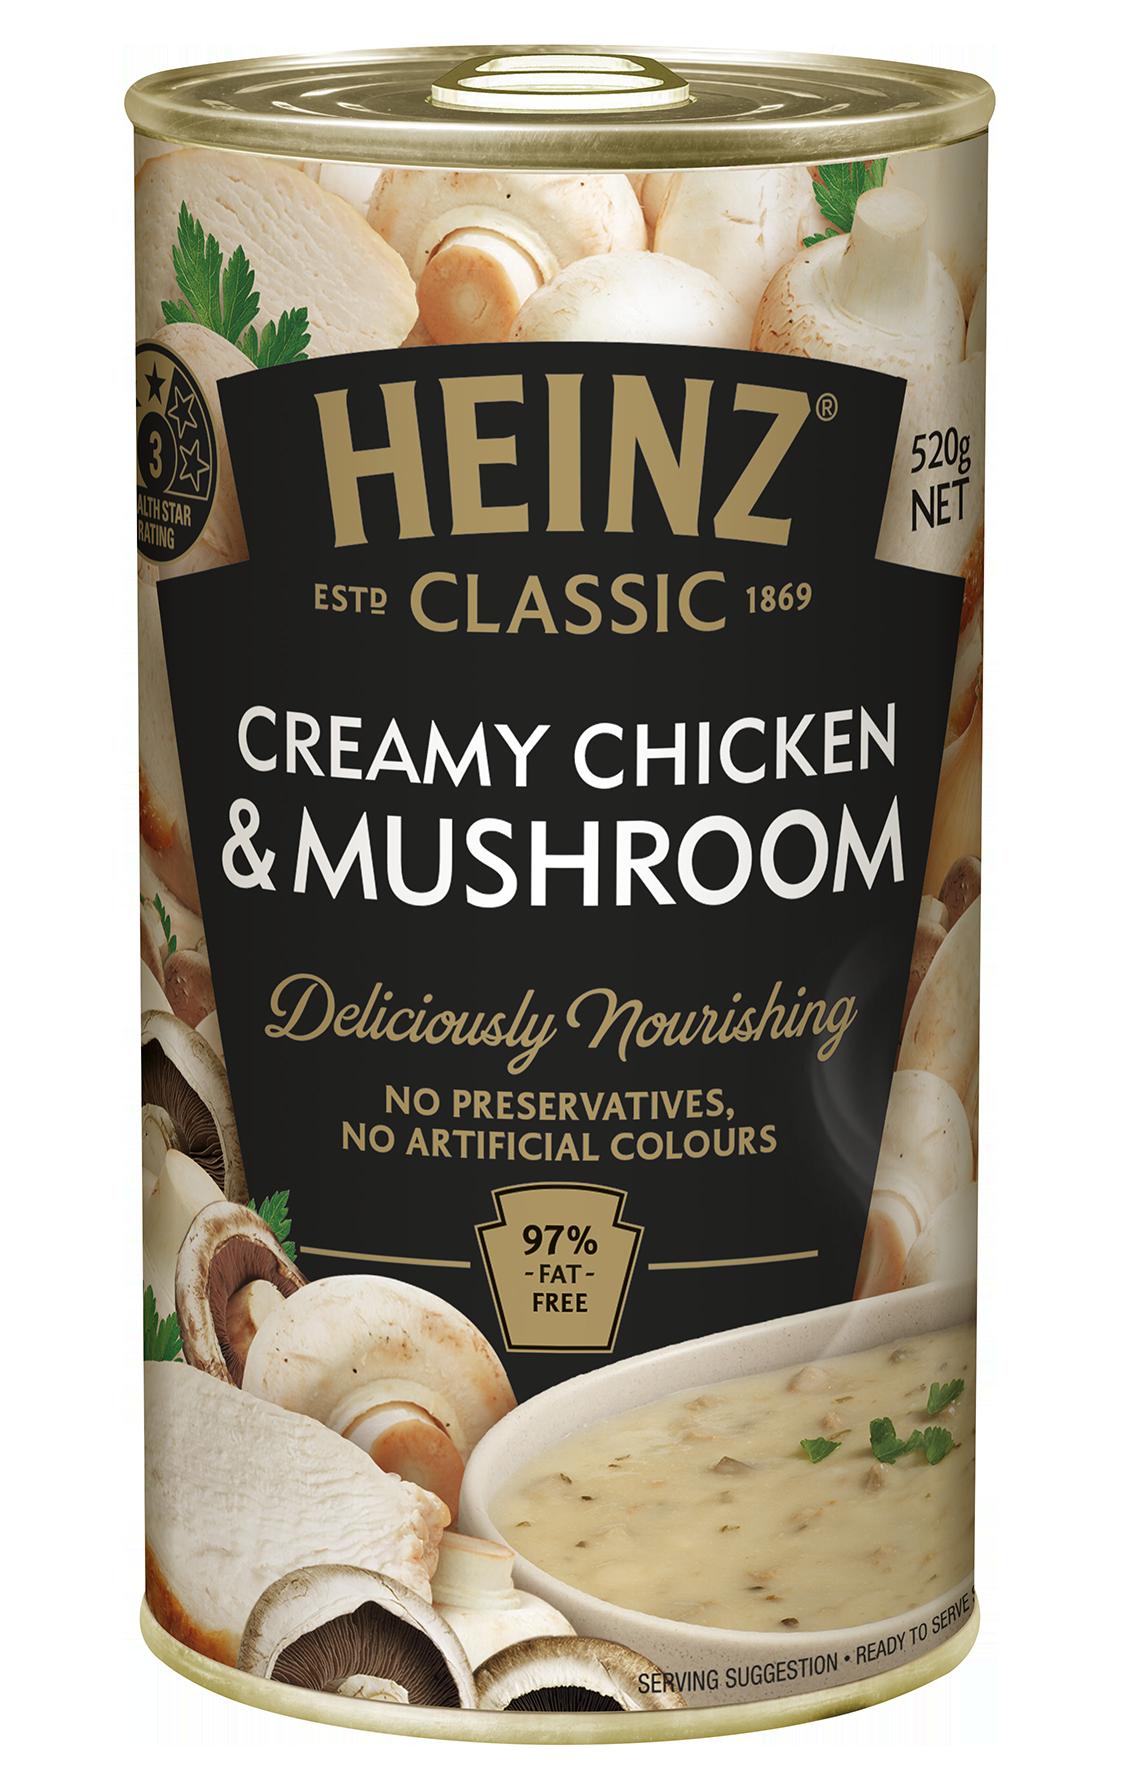 Heinz Classic Creamy Chicken and Mushroom Soup